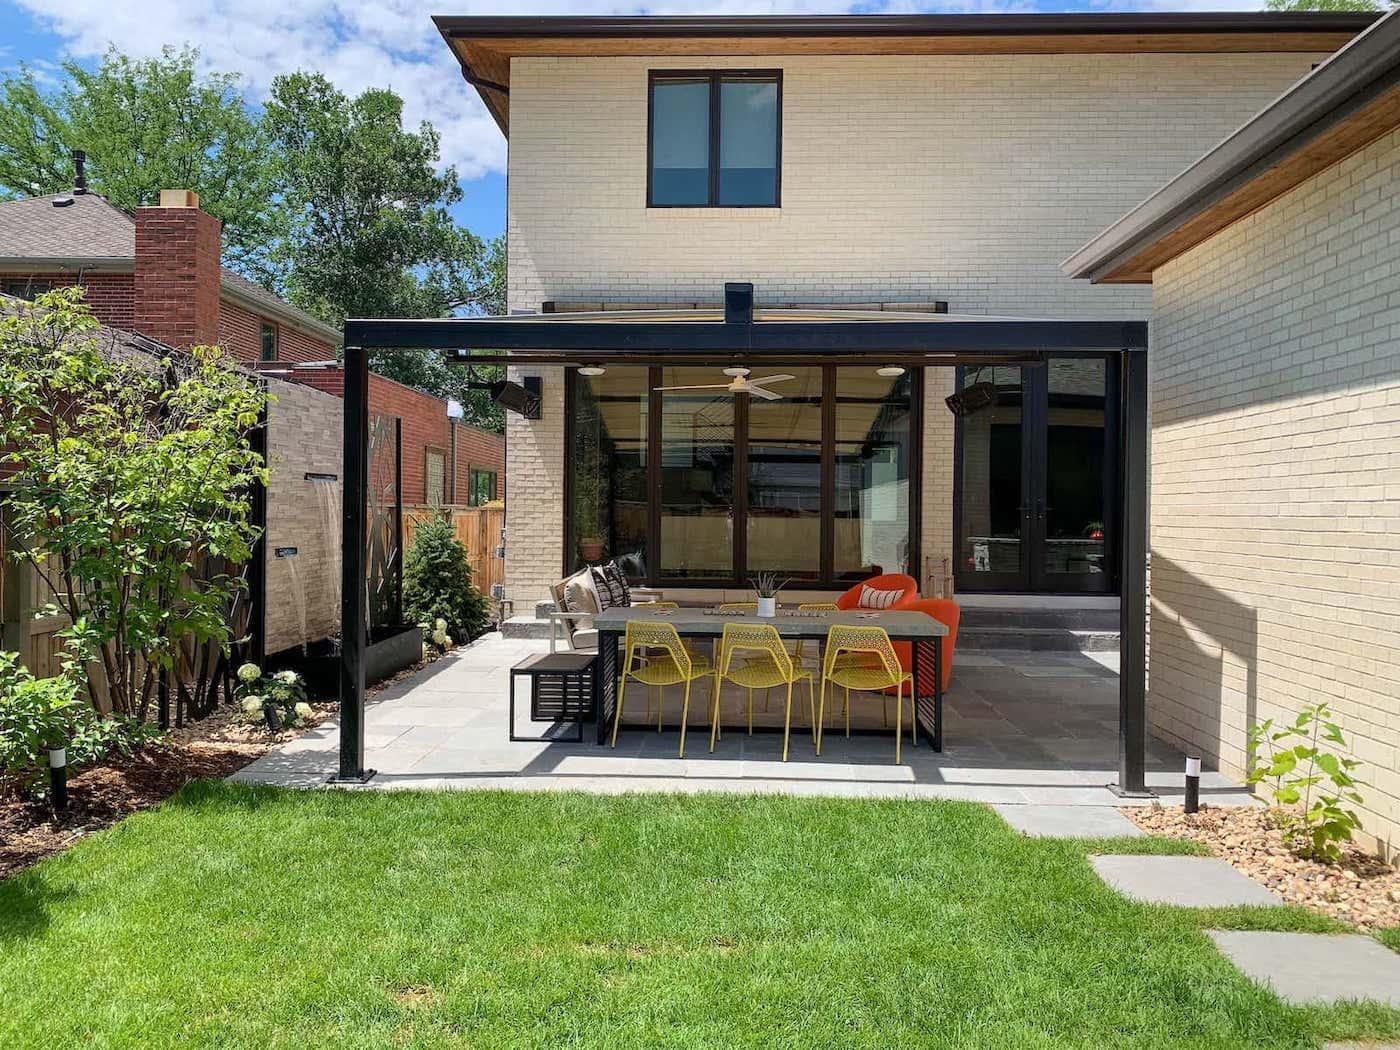 Pergola Patio Outdoor Kitchen Bonnie Brae Denver CO